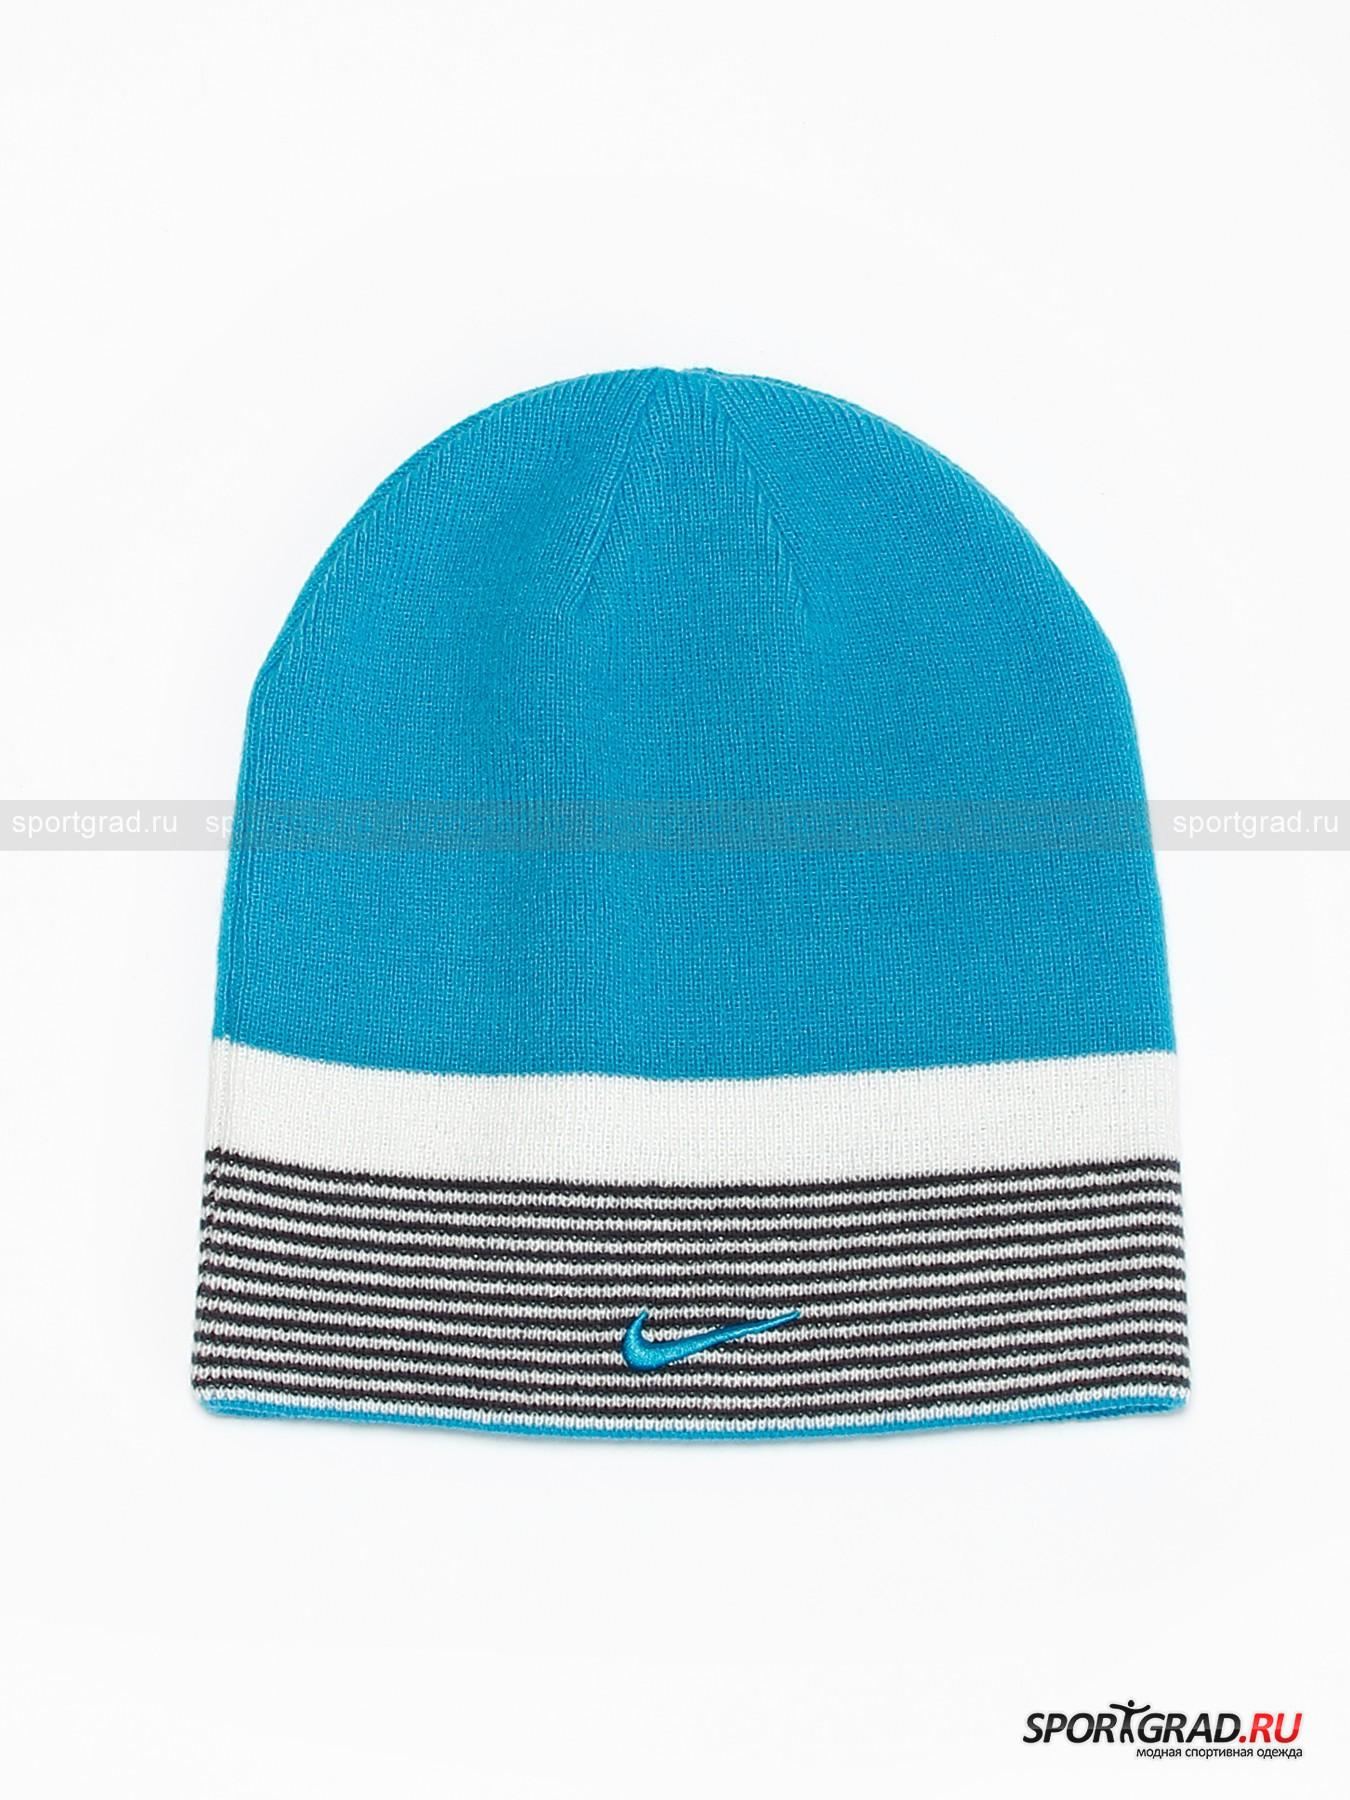 Мужская шапка NIKE Misc Divers